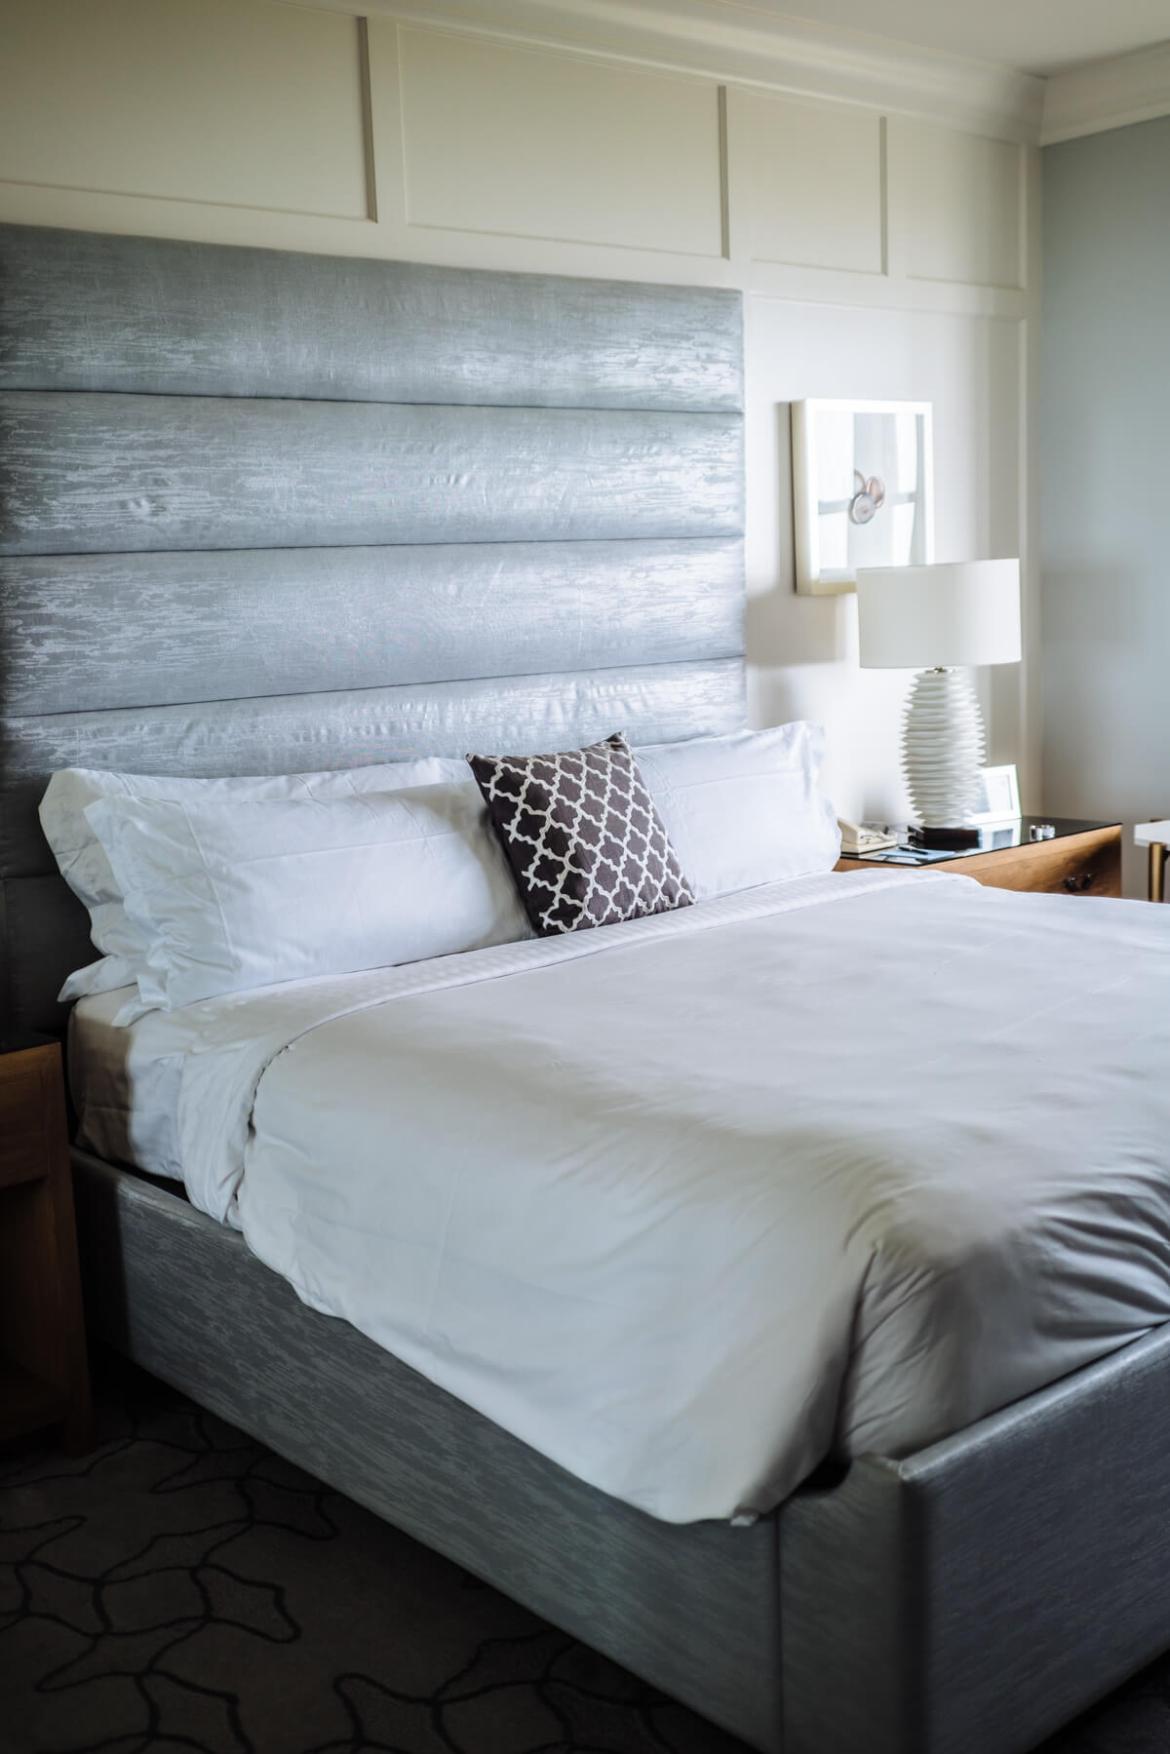 Room at The Ritz-Carlton Half Moon Bay